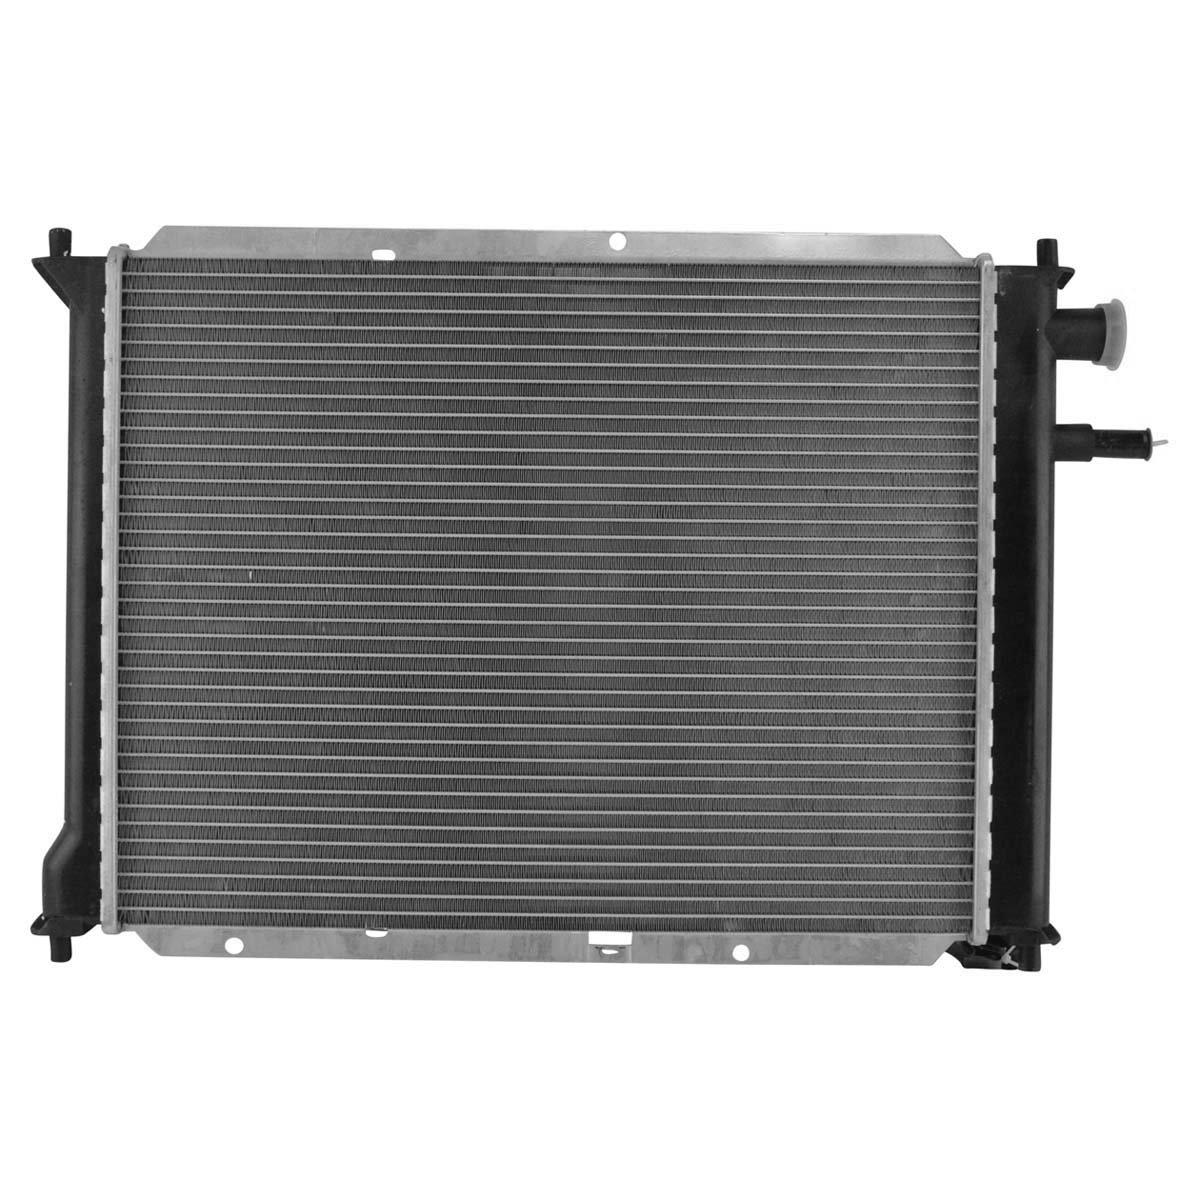 Amazon.com: Radiator Assembly Aluminum Core Direct Fit for 98-03 Ford  Escort ZX2 DOHC 2.0L: Automotive